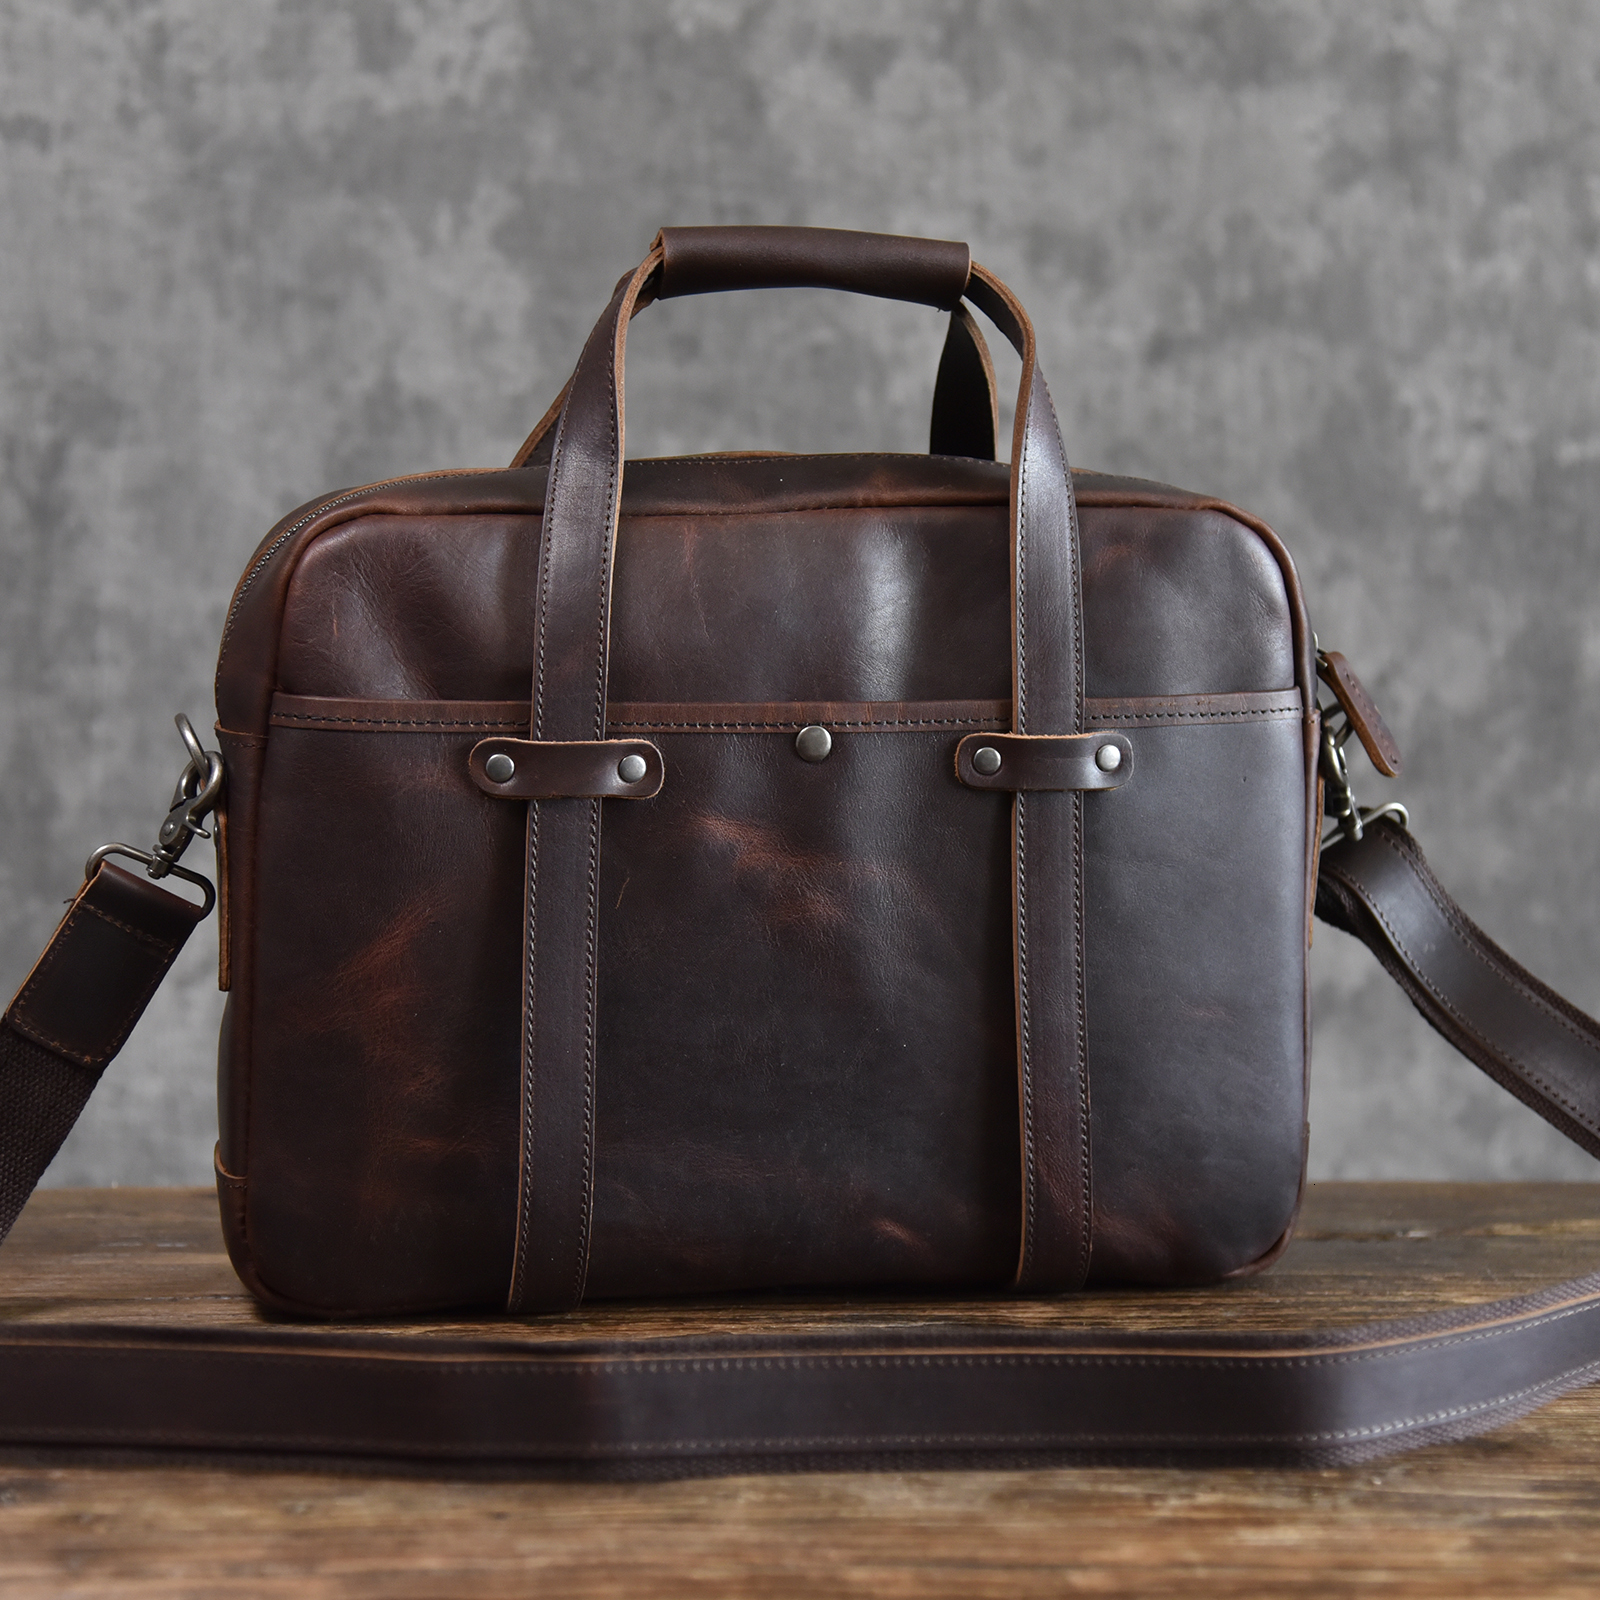 Men's Bag Genuine Leather Crossbody Bags Male Messenger Bag Men Shoulder Bags 14'' Laptop Briefcases Man Totes Handbags